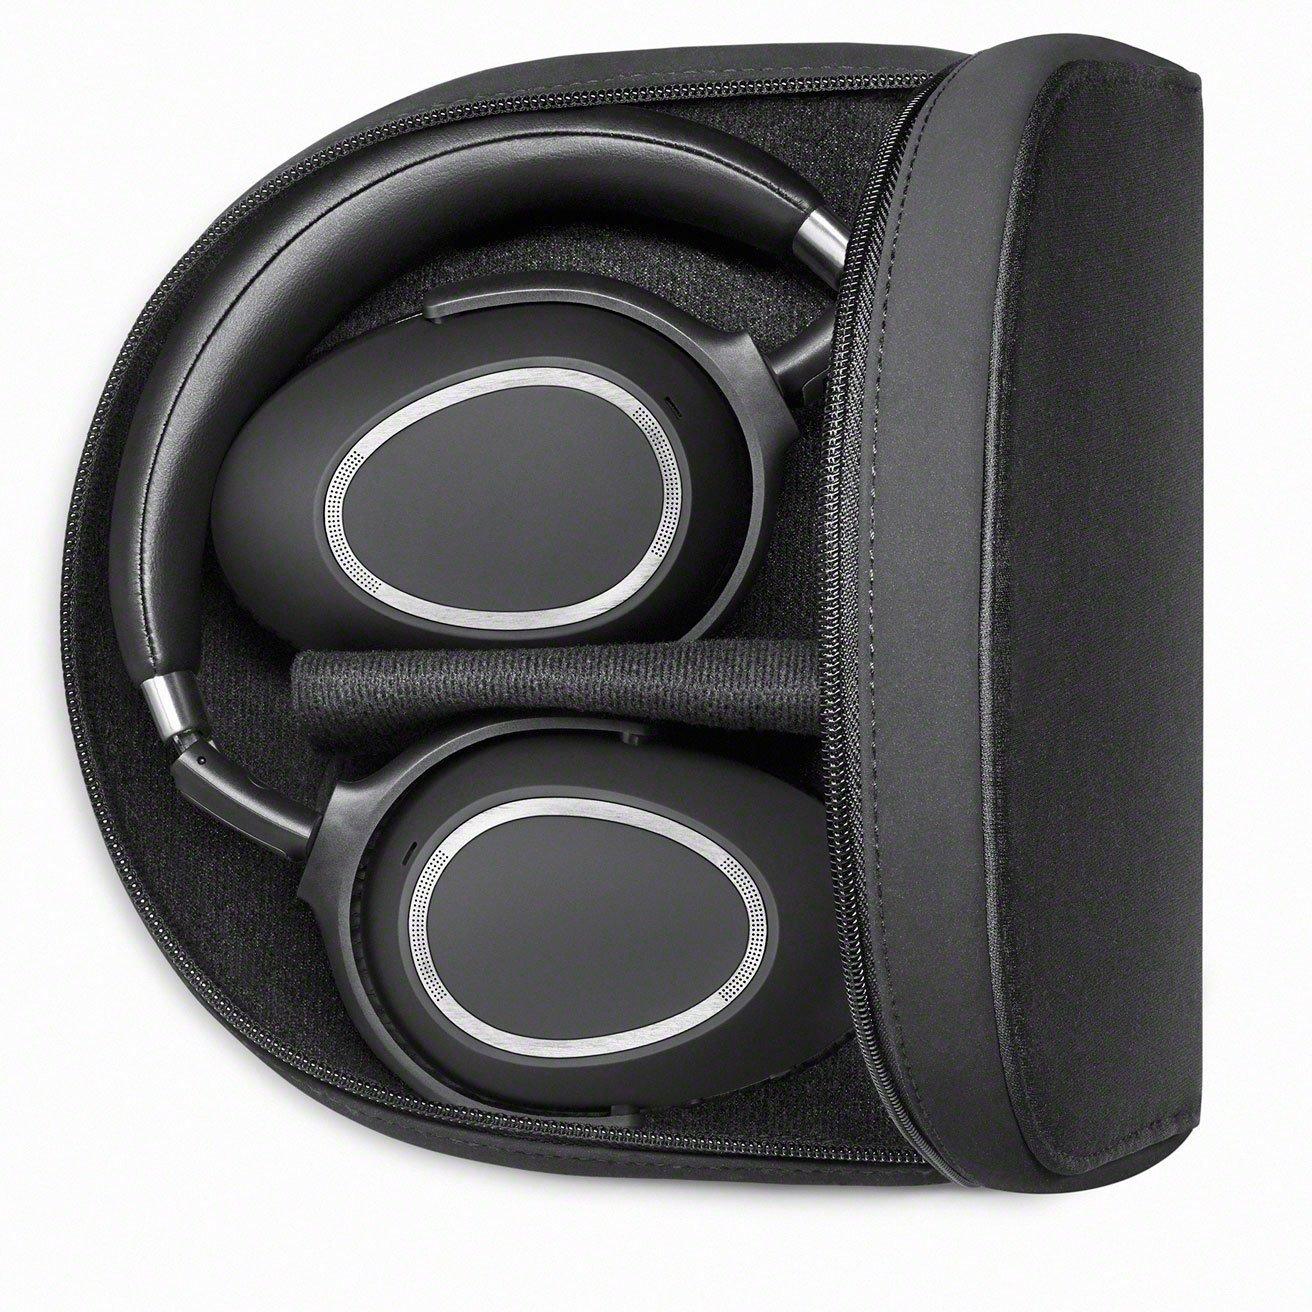 Sennheiser PXC-550 Wireless Noise Cancelling Headphones image